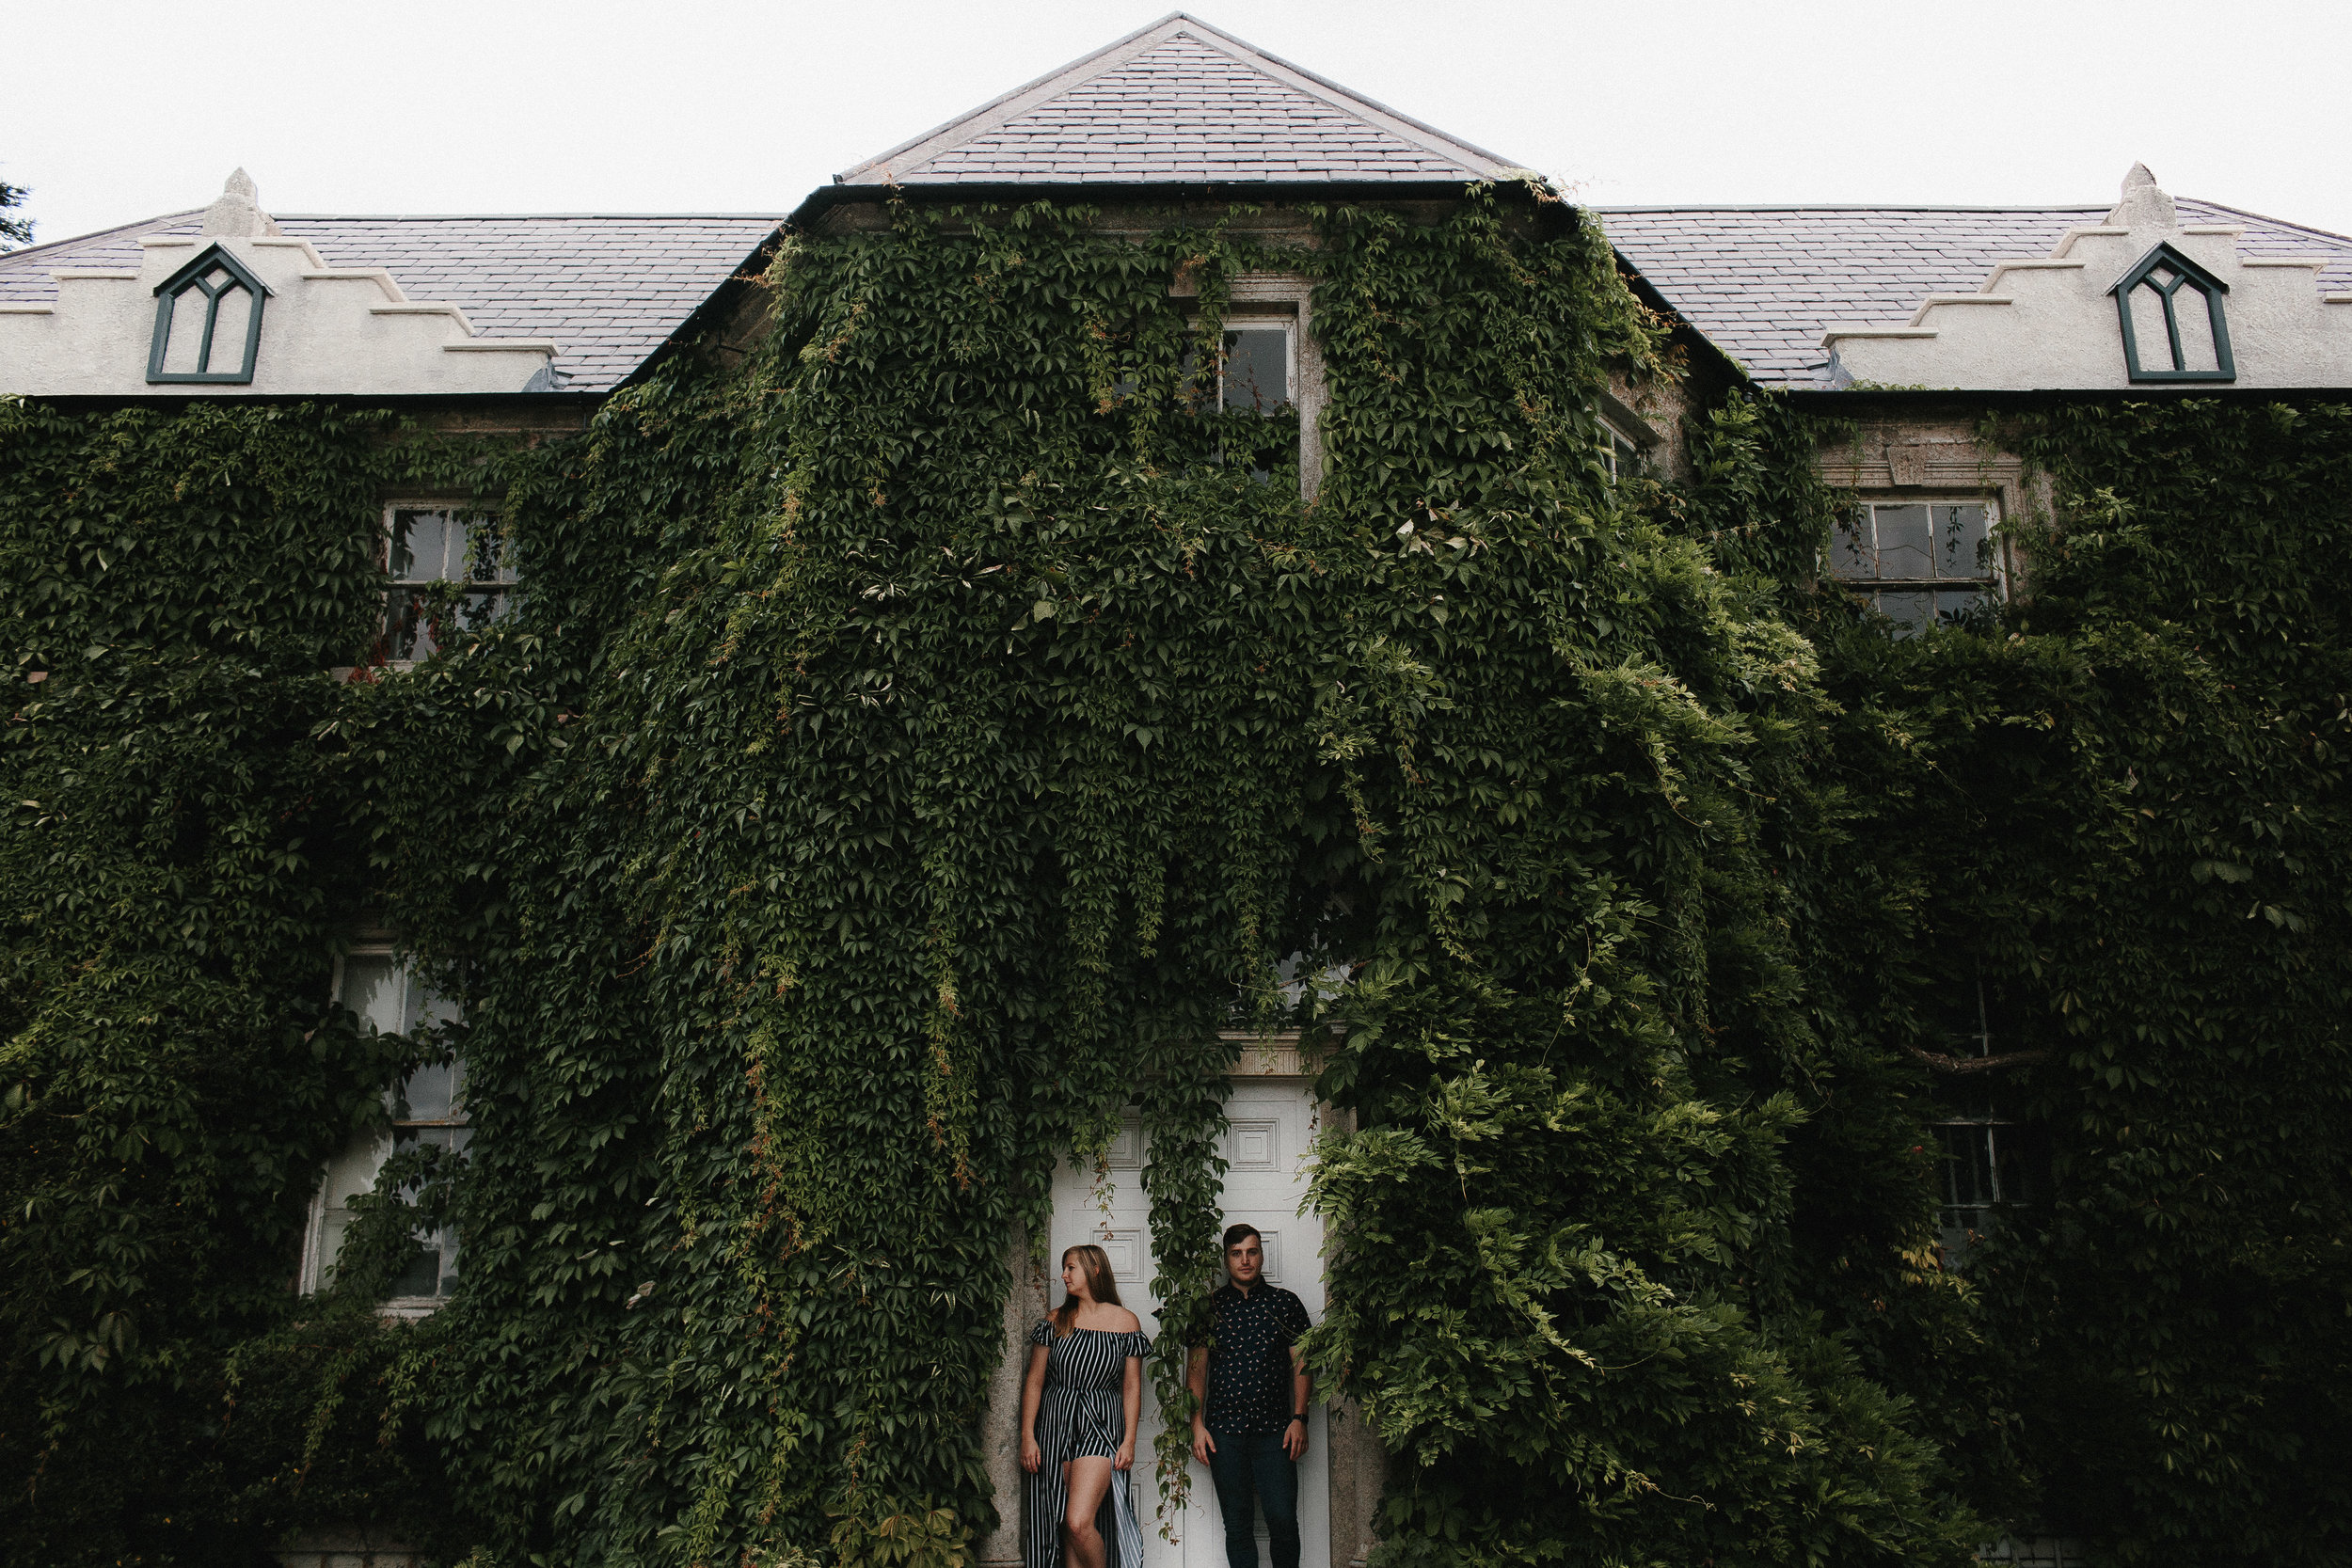 ireland_county_wicklow_glendalough_engagement_adventure_photography_windy_moody_atlanta_wedding_photographer_1135.jpg